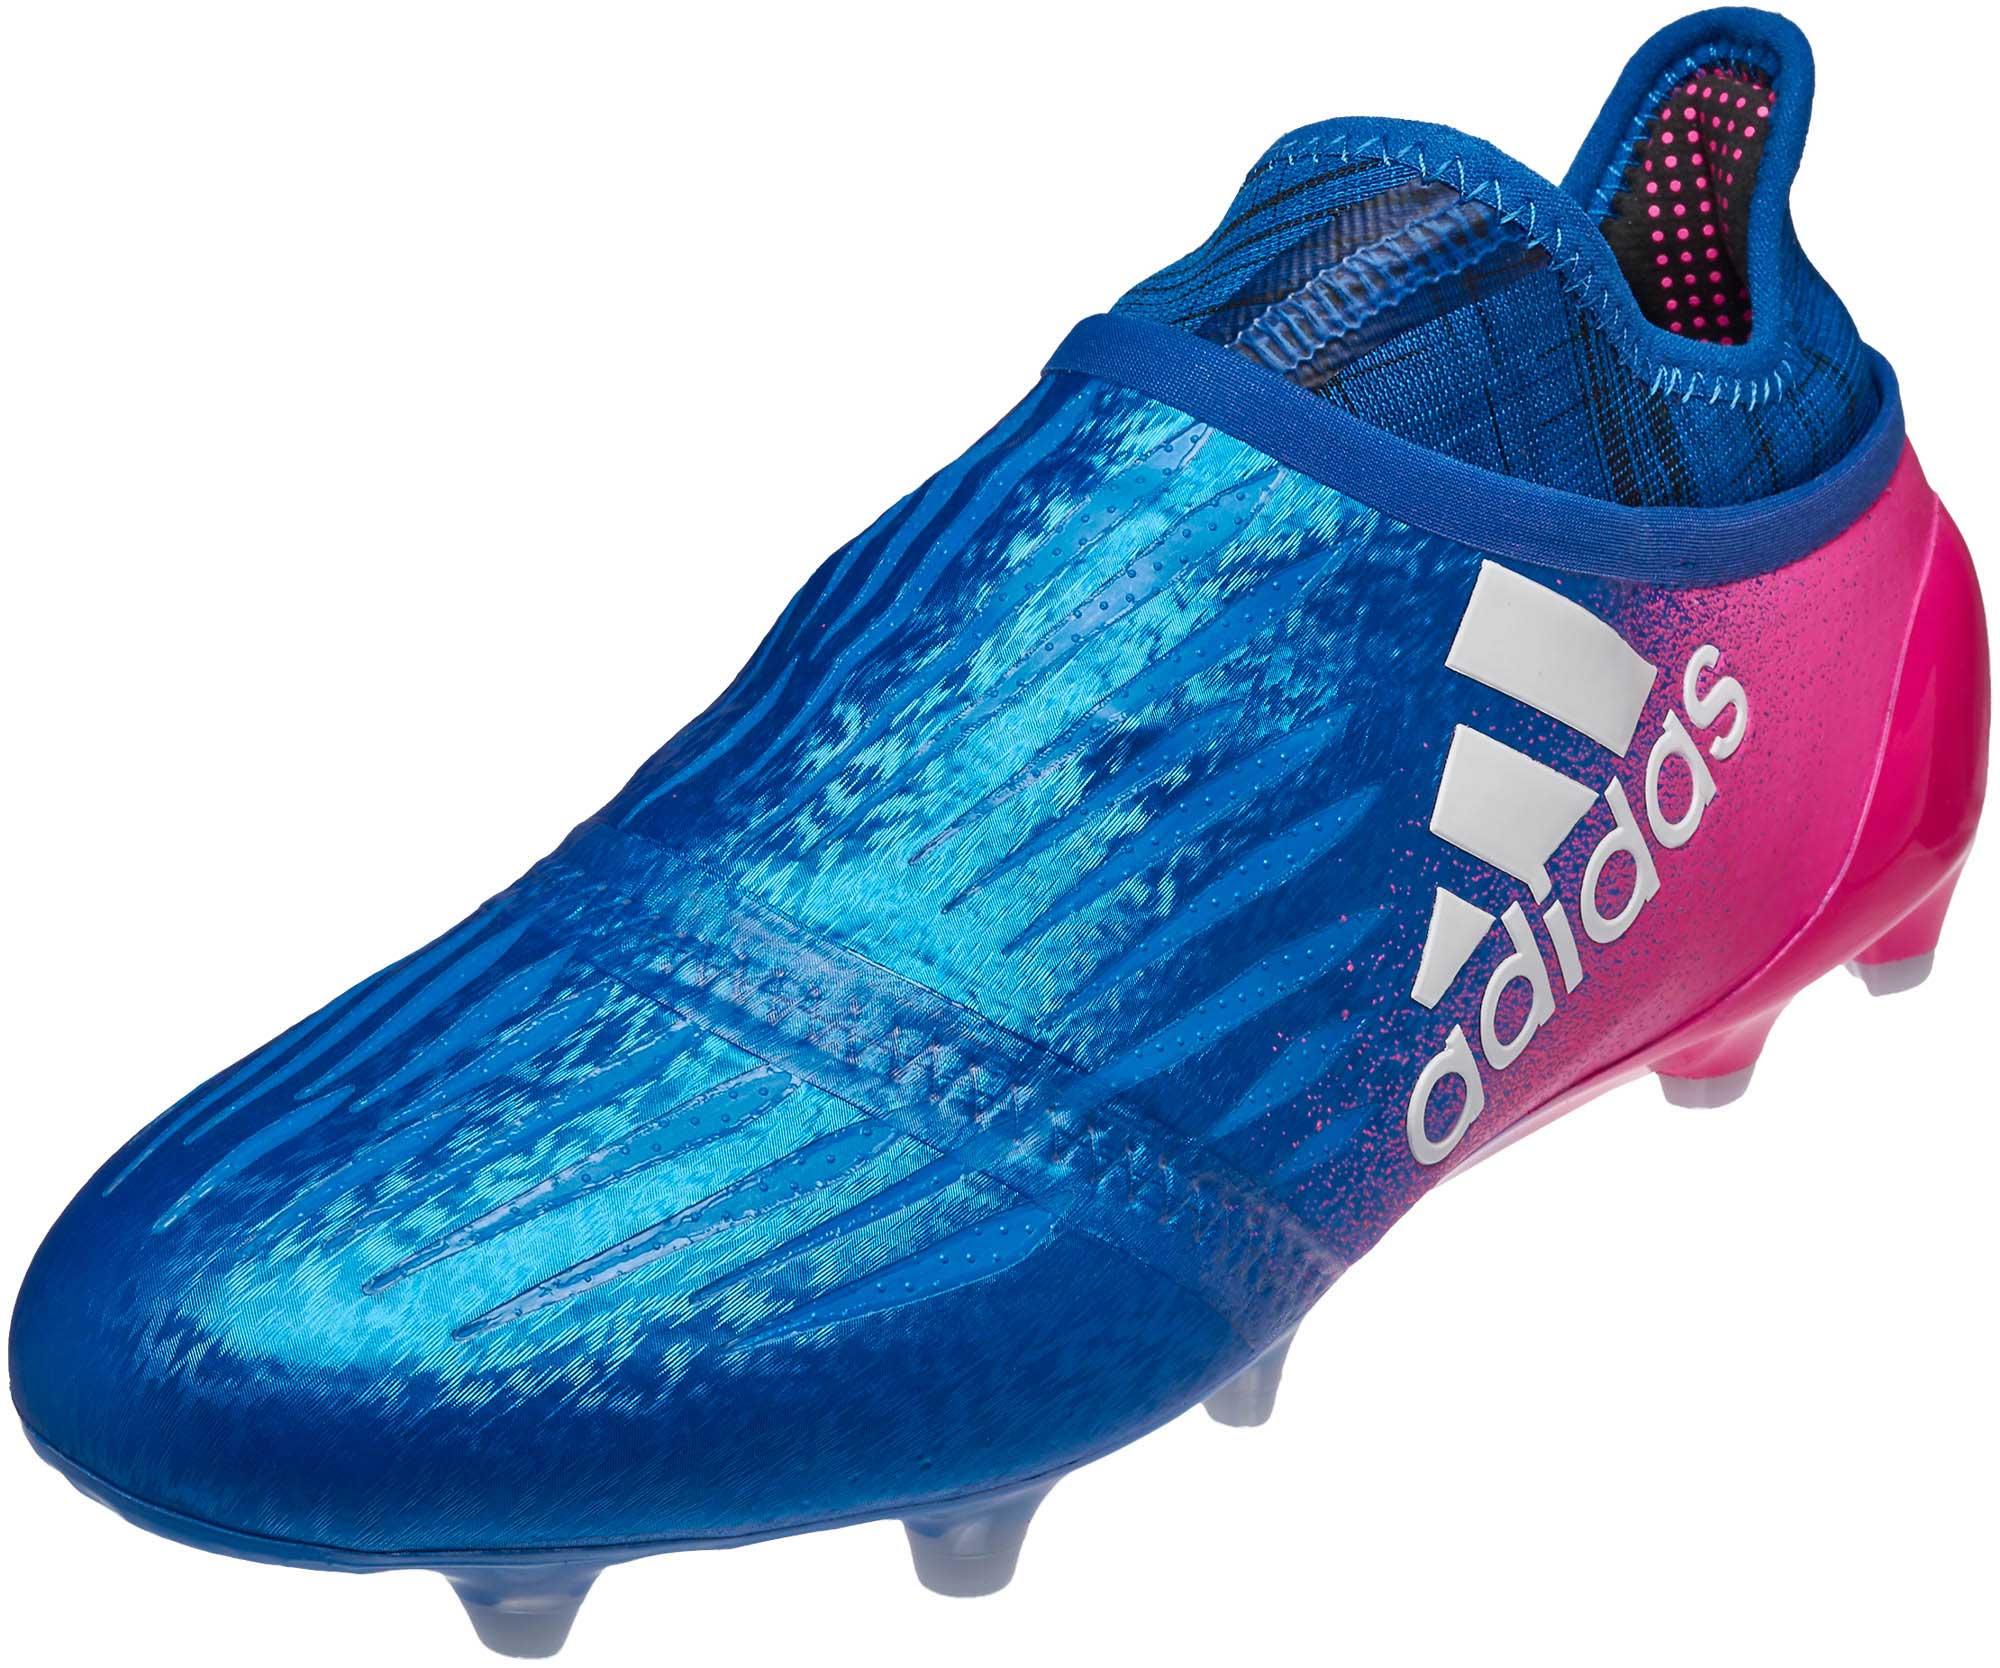 756c8d18f adidas X 16+ Purechaos FG Soccer Cleats - Blue   Shock Pink - Soccer ...